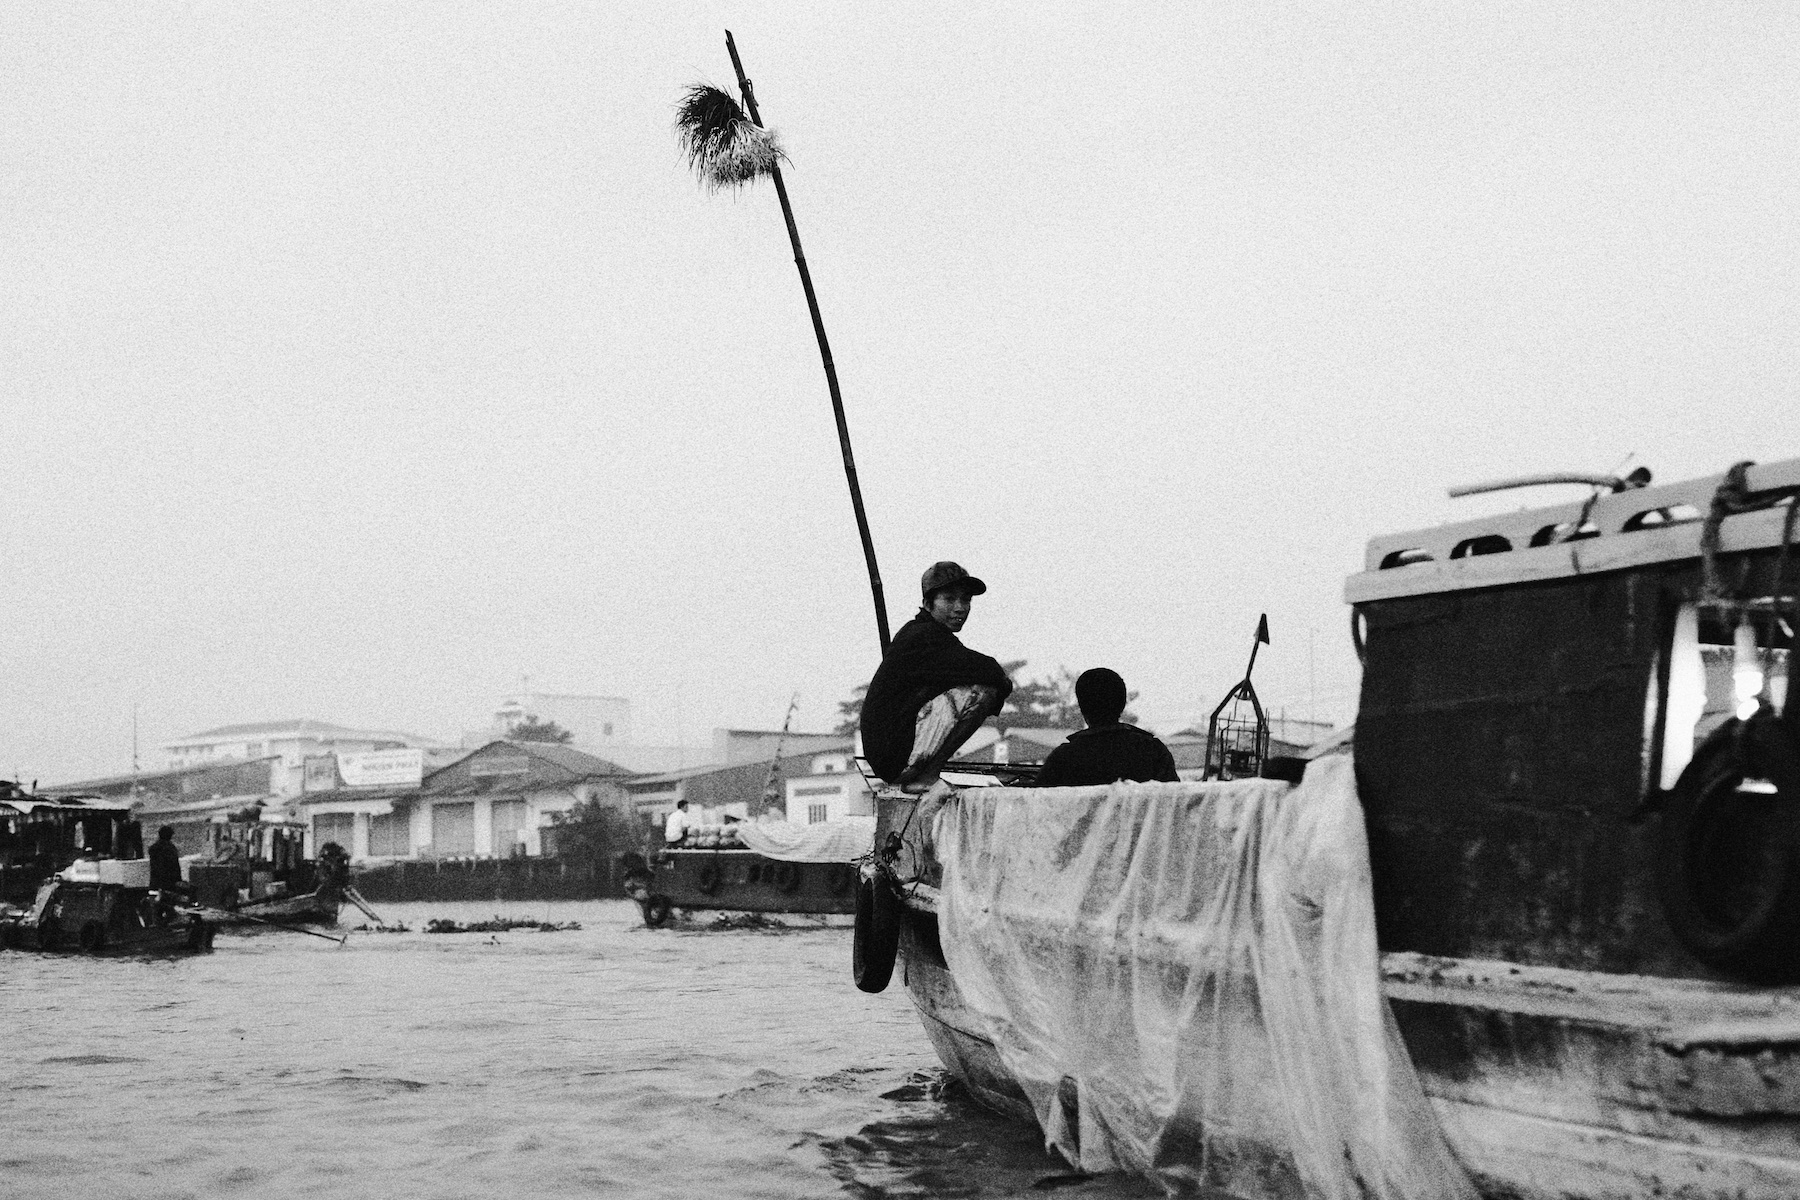 MEKONG DELTA VIETNAM © Manoah Biesheuvel 9